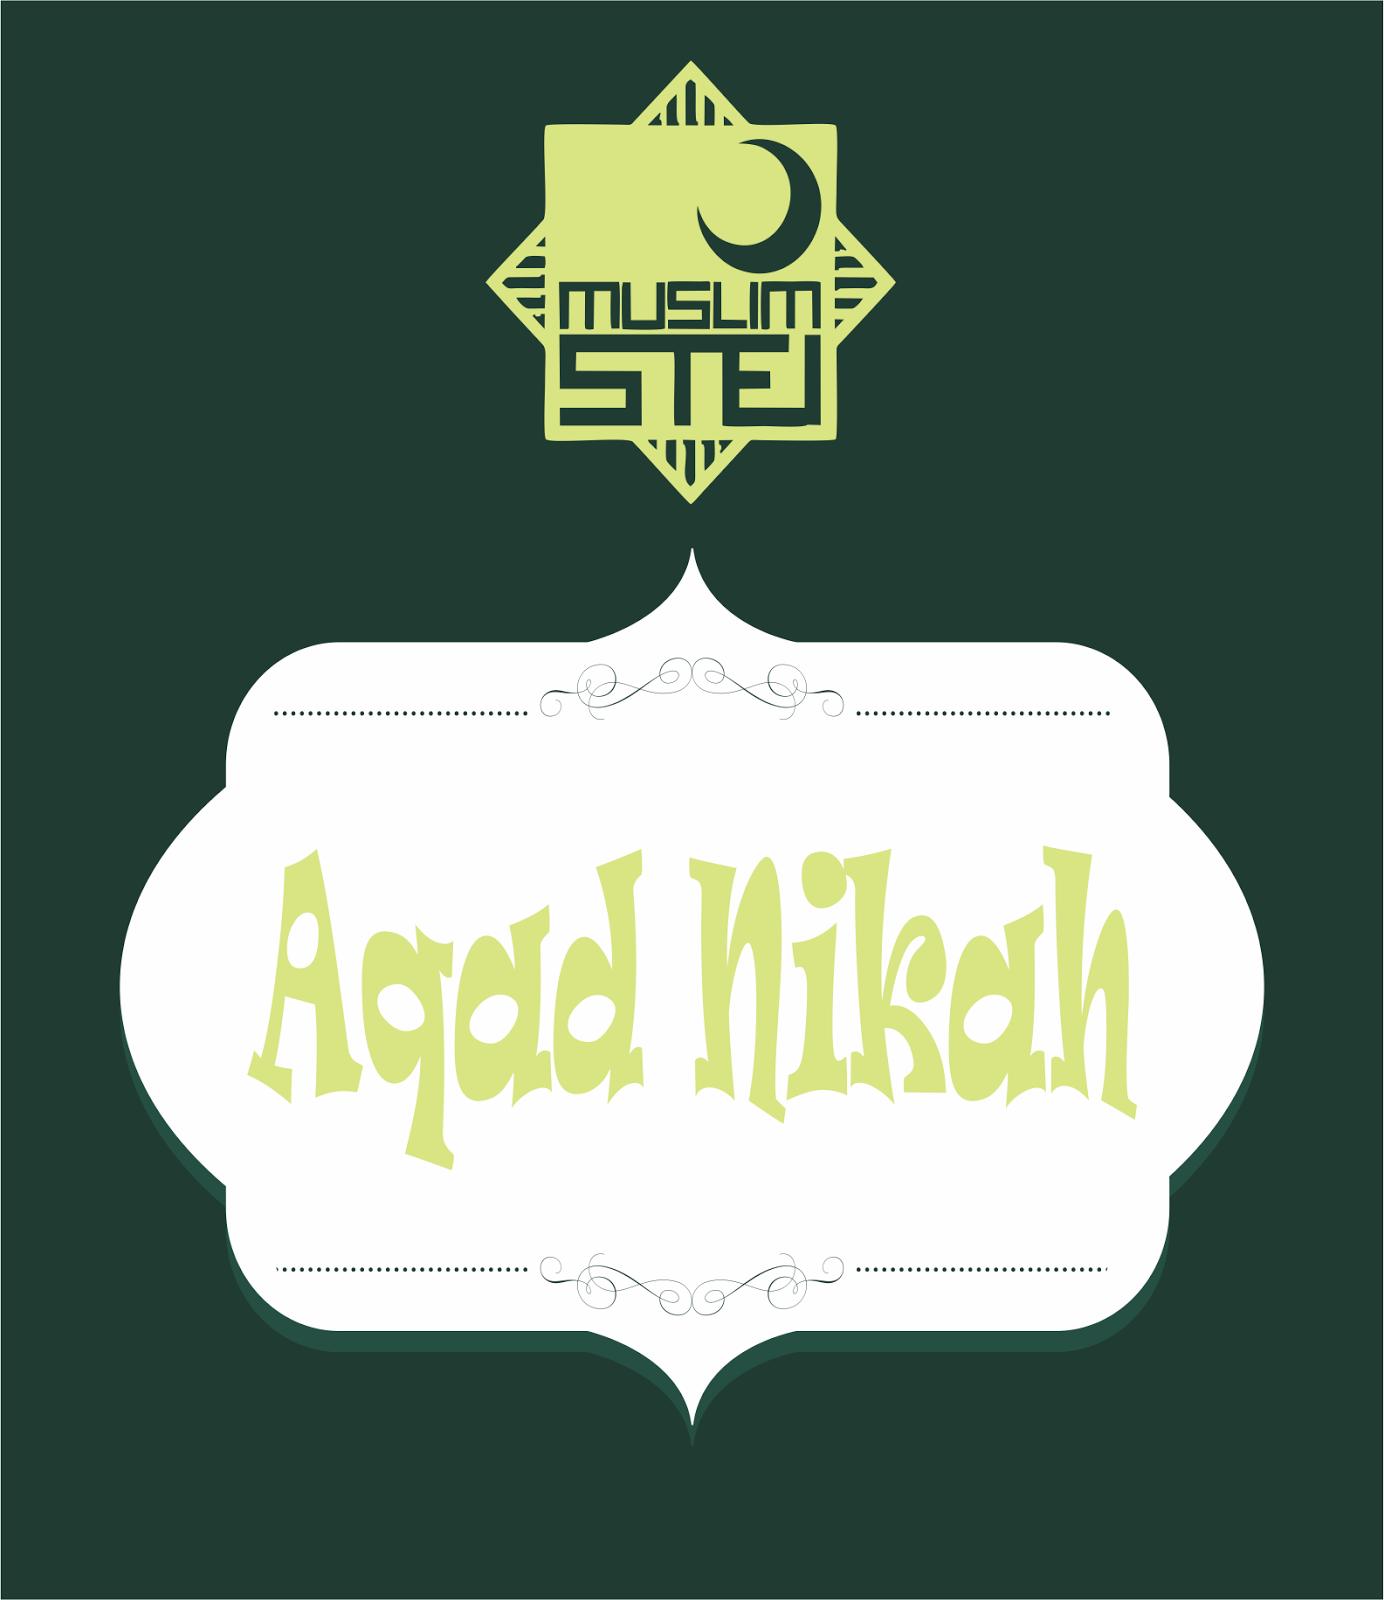 Tata Cara Pernikahan Dalam Islam - Aqad Nikah  37f9cd5f98